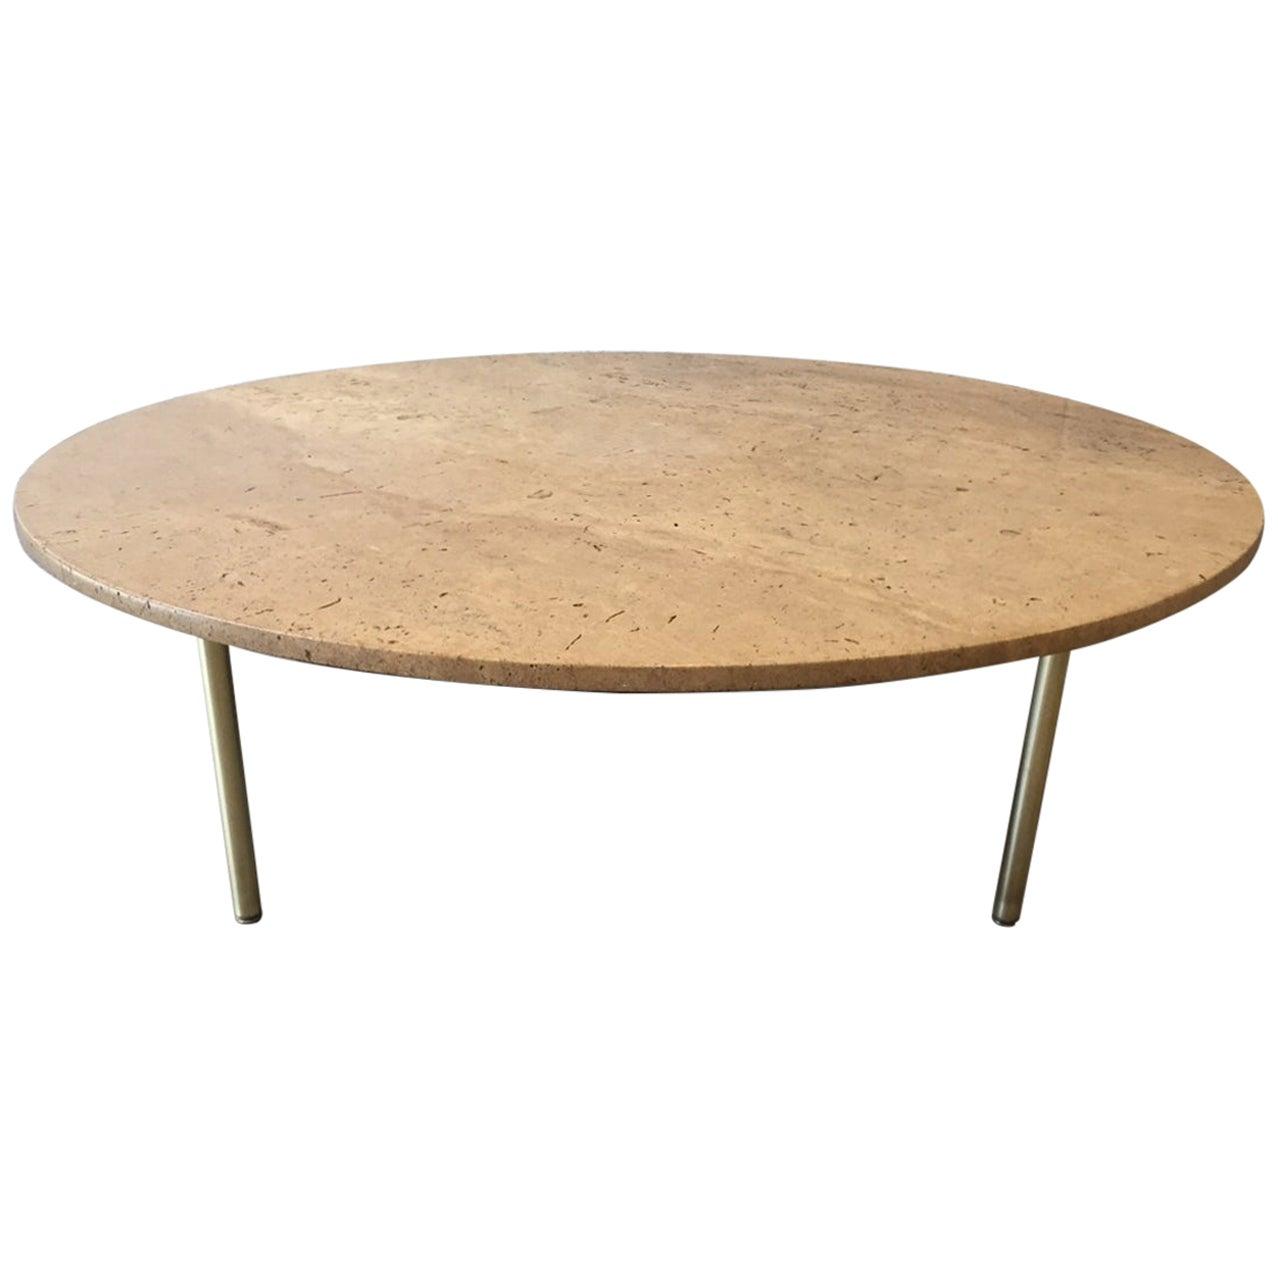 1950s Italian Travertine and Bronze Coffee Table